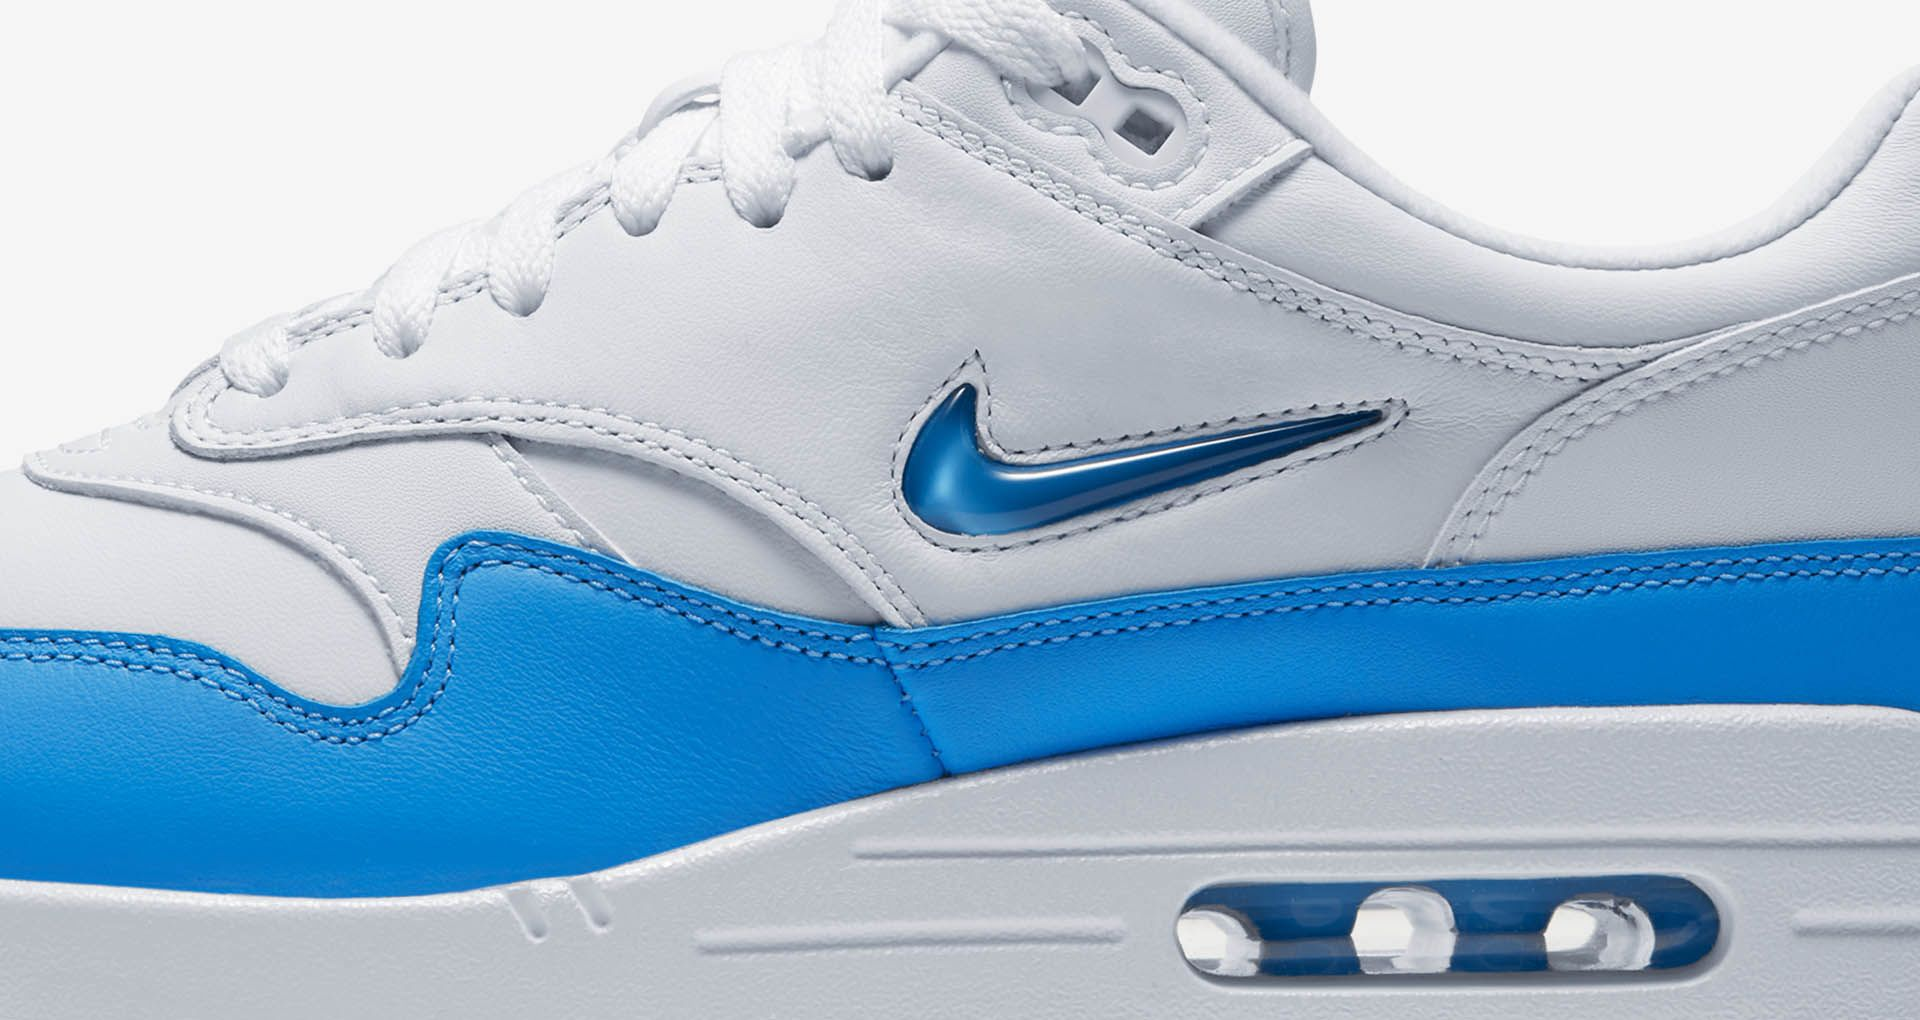 Nike De Sortie Air Premium Date La 1 « Jewel Whiteamp; Max ikZPuX